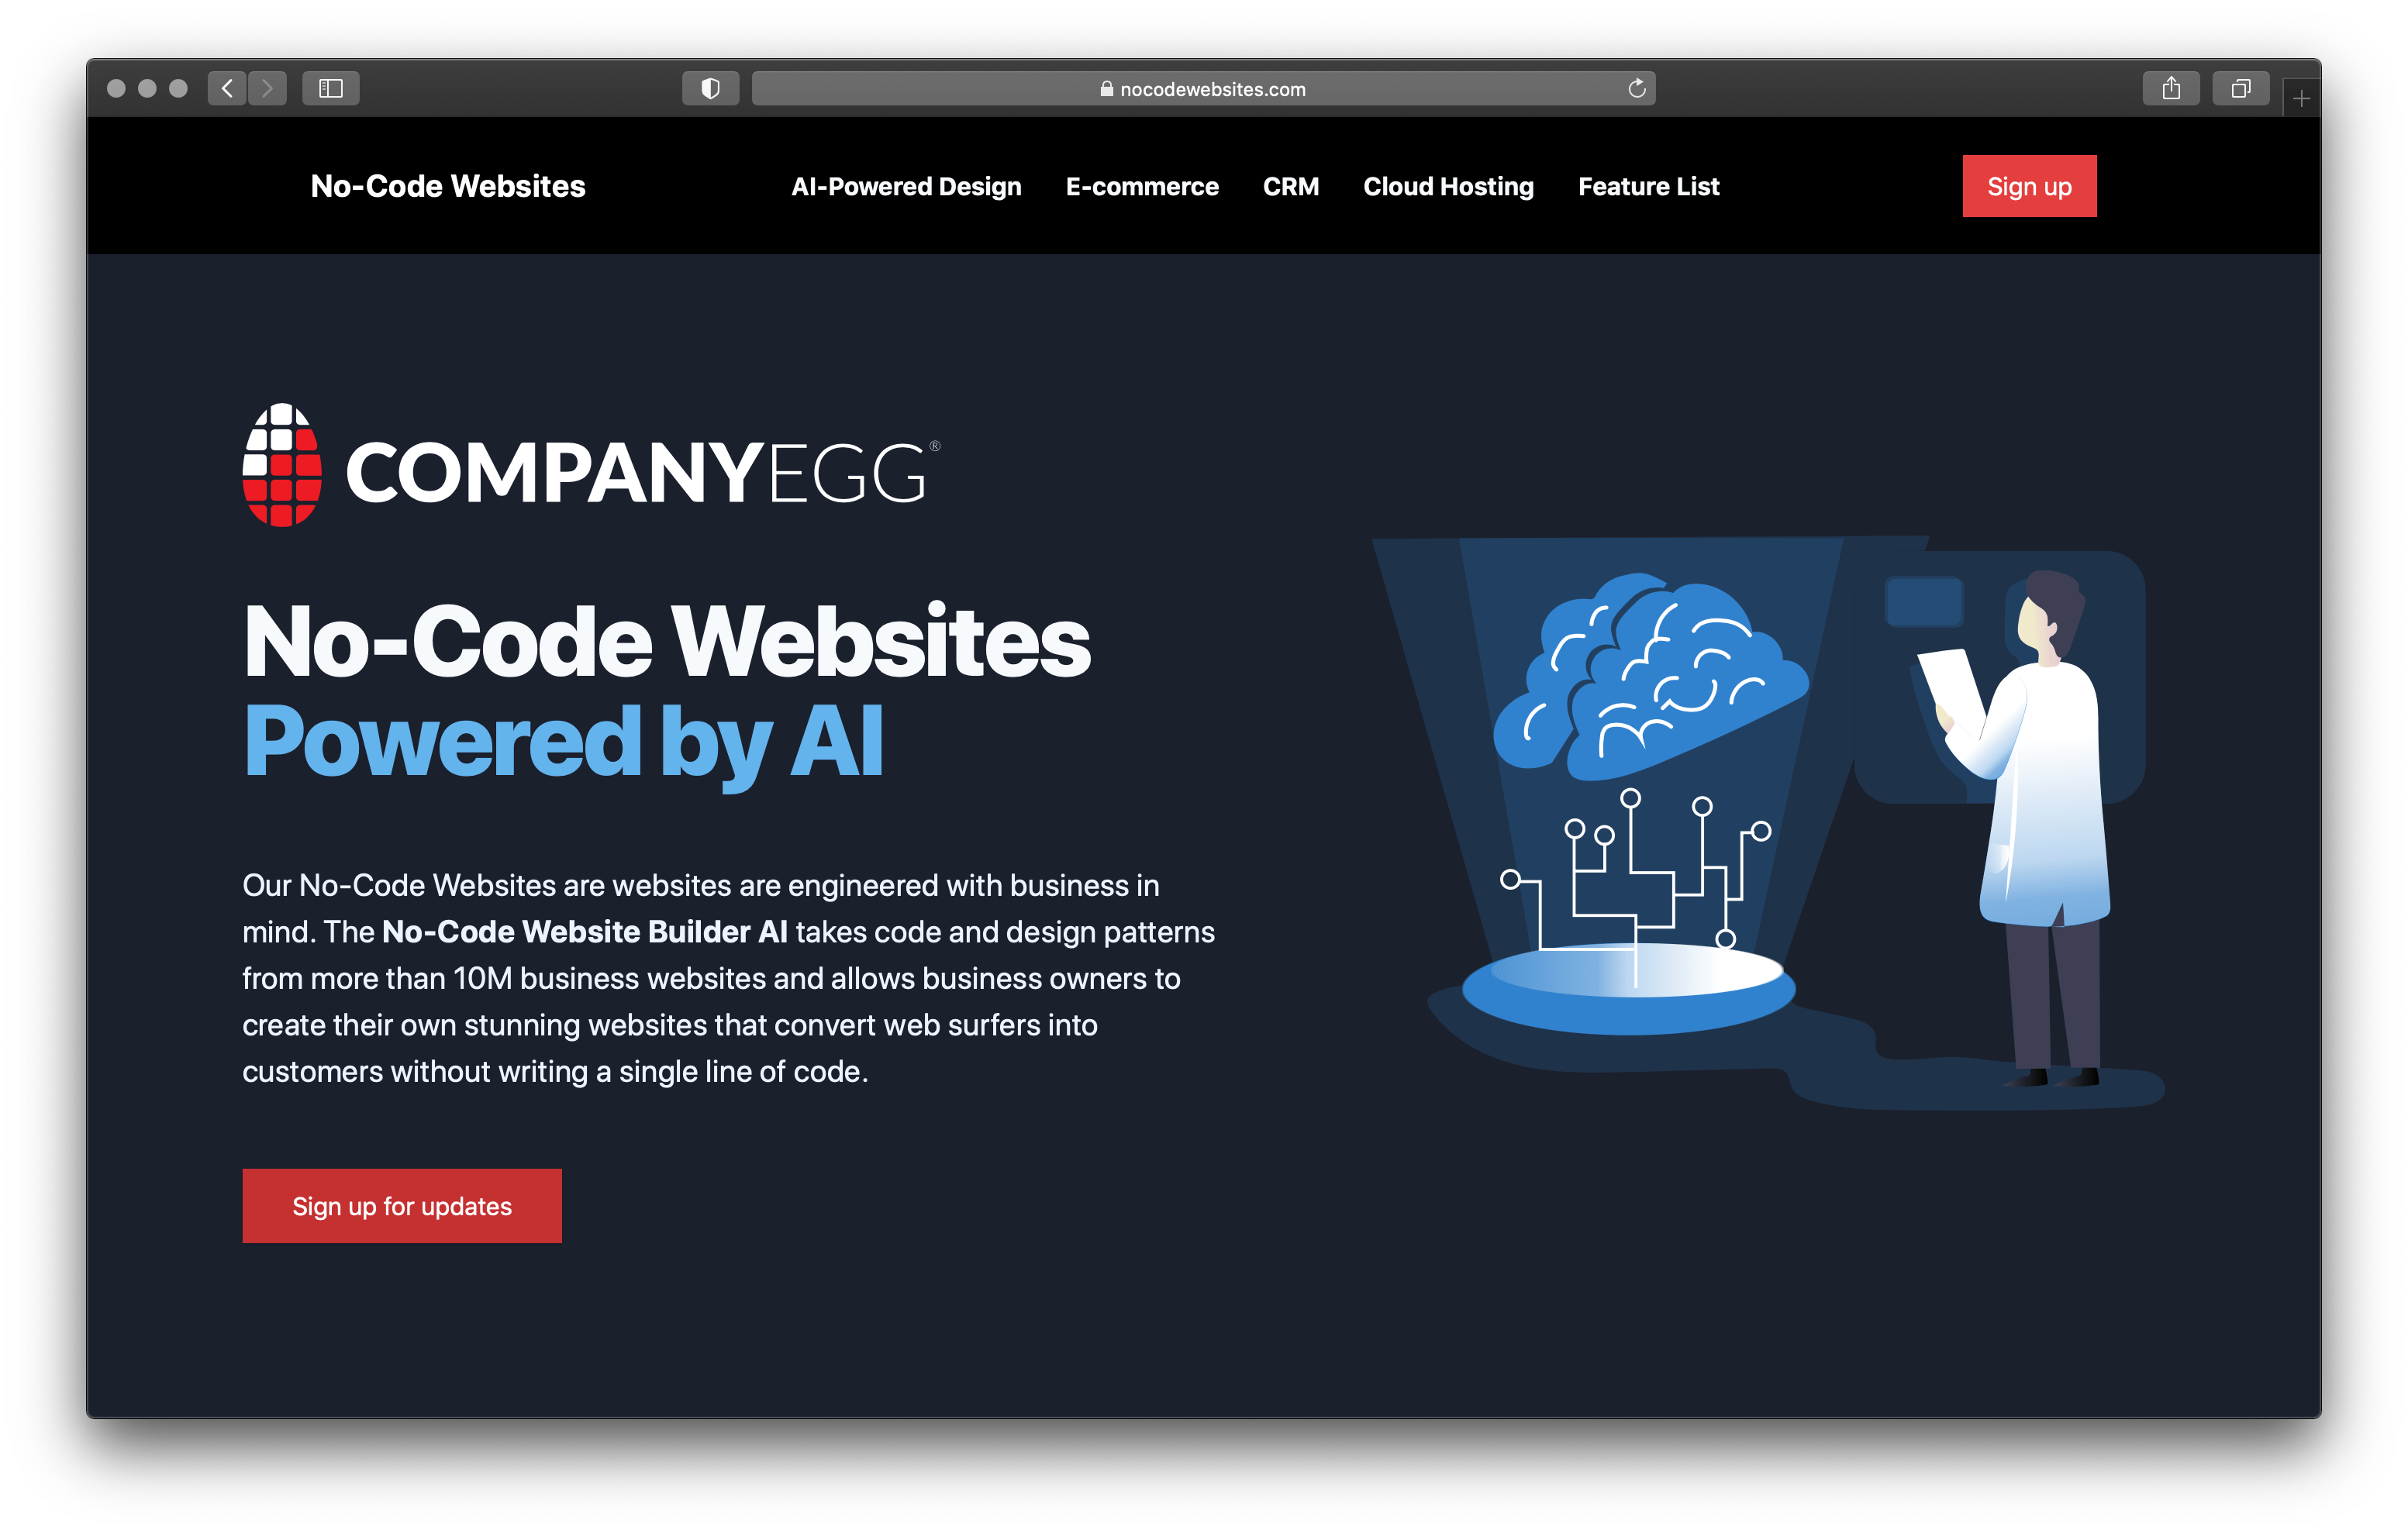 NoCodeWebsites.com